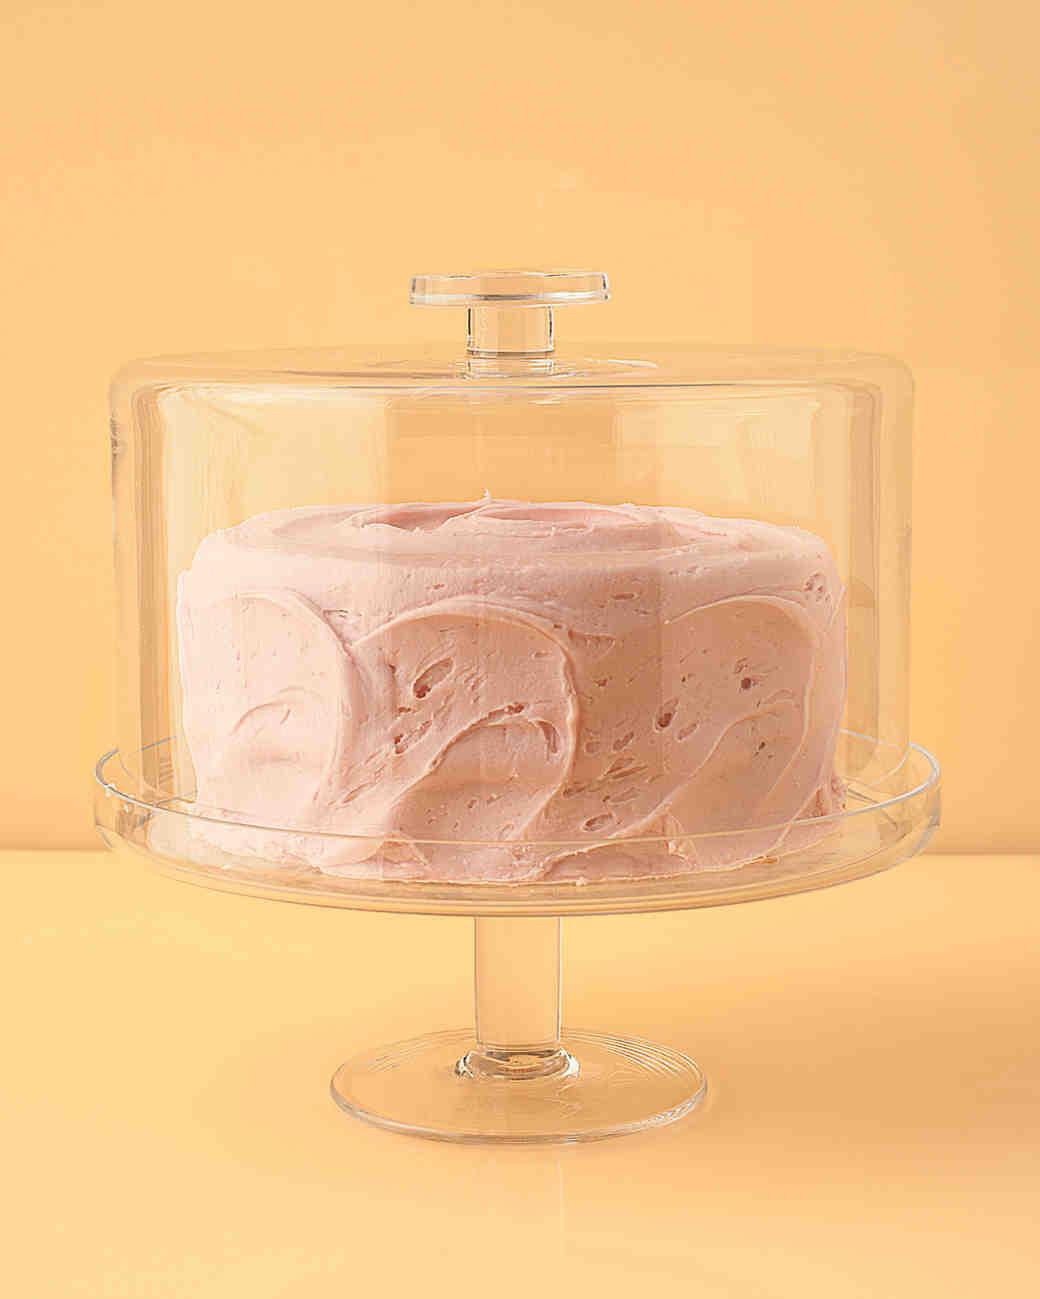 cake-stand-mwd108267.jpg